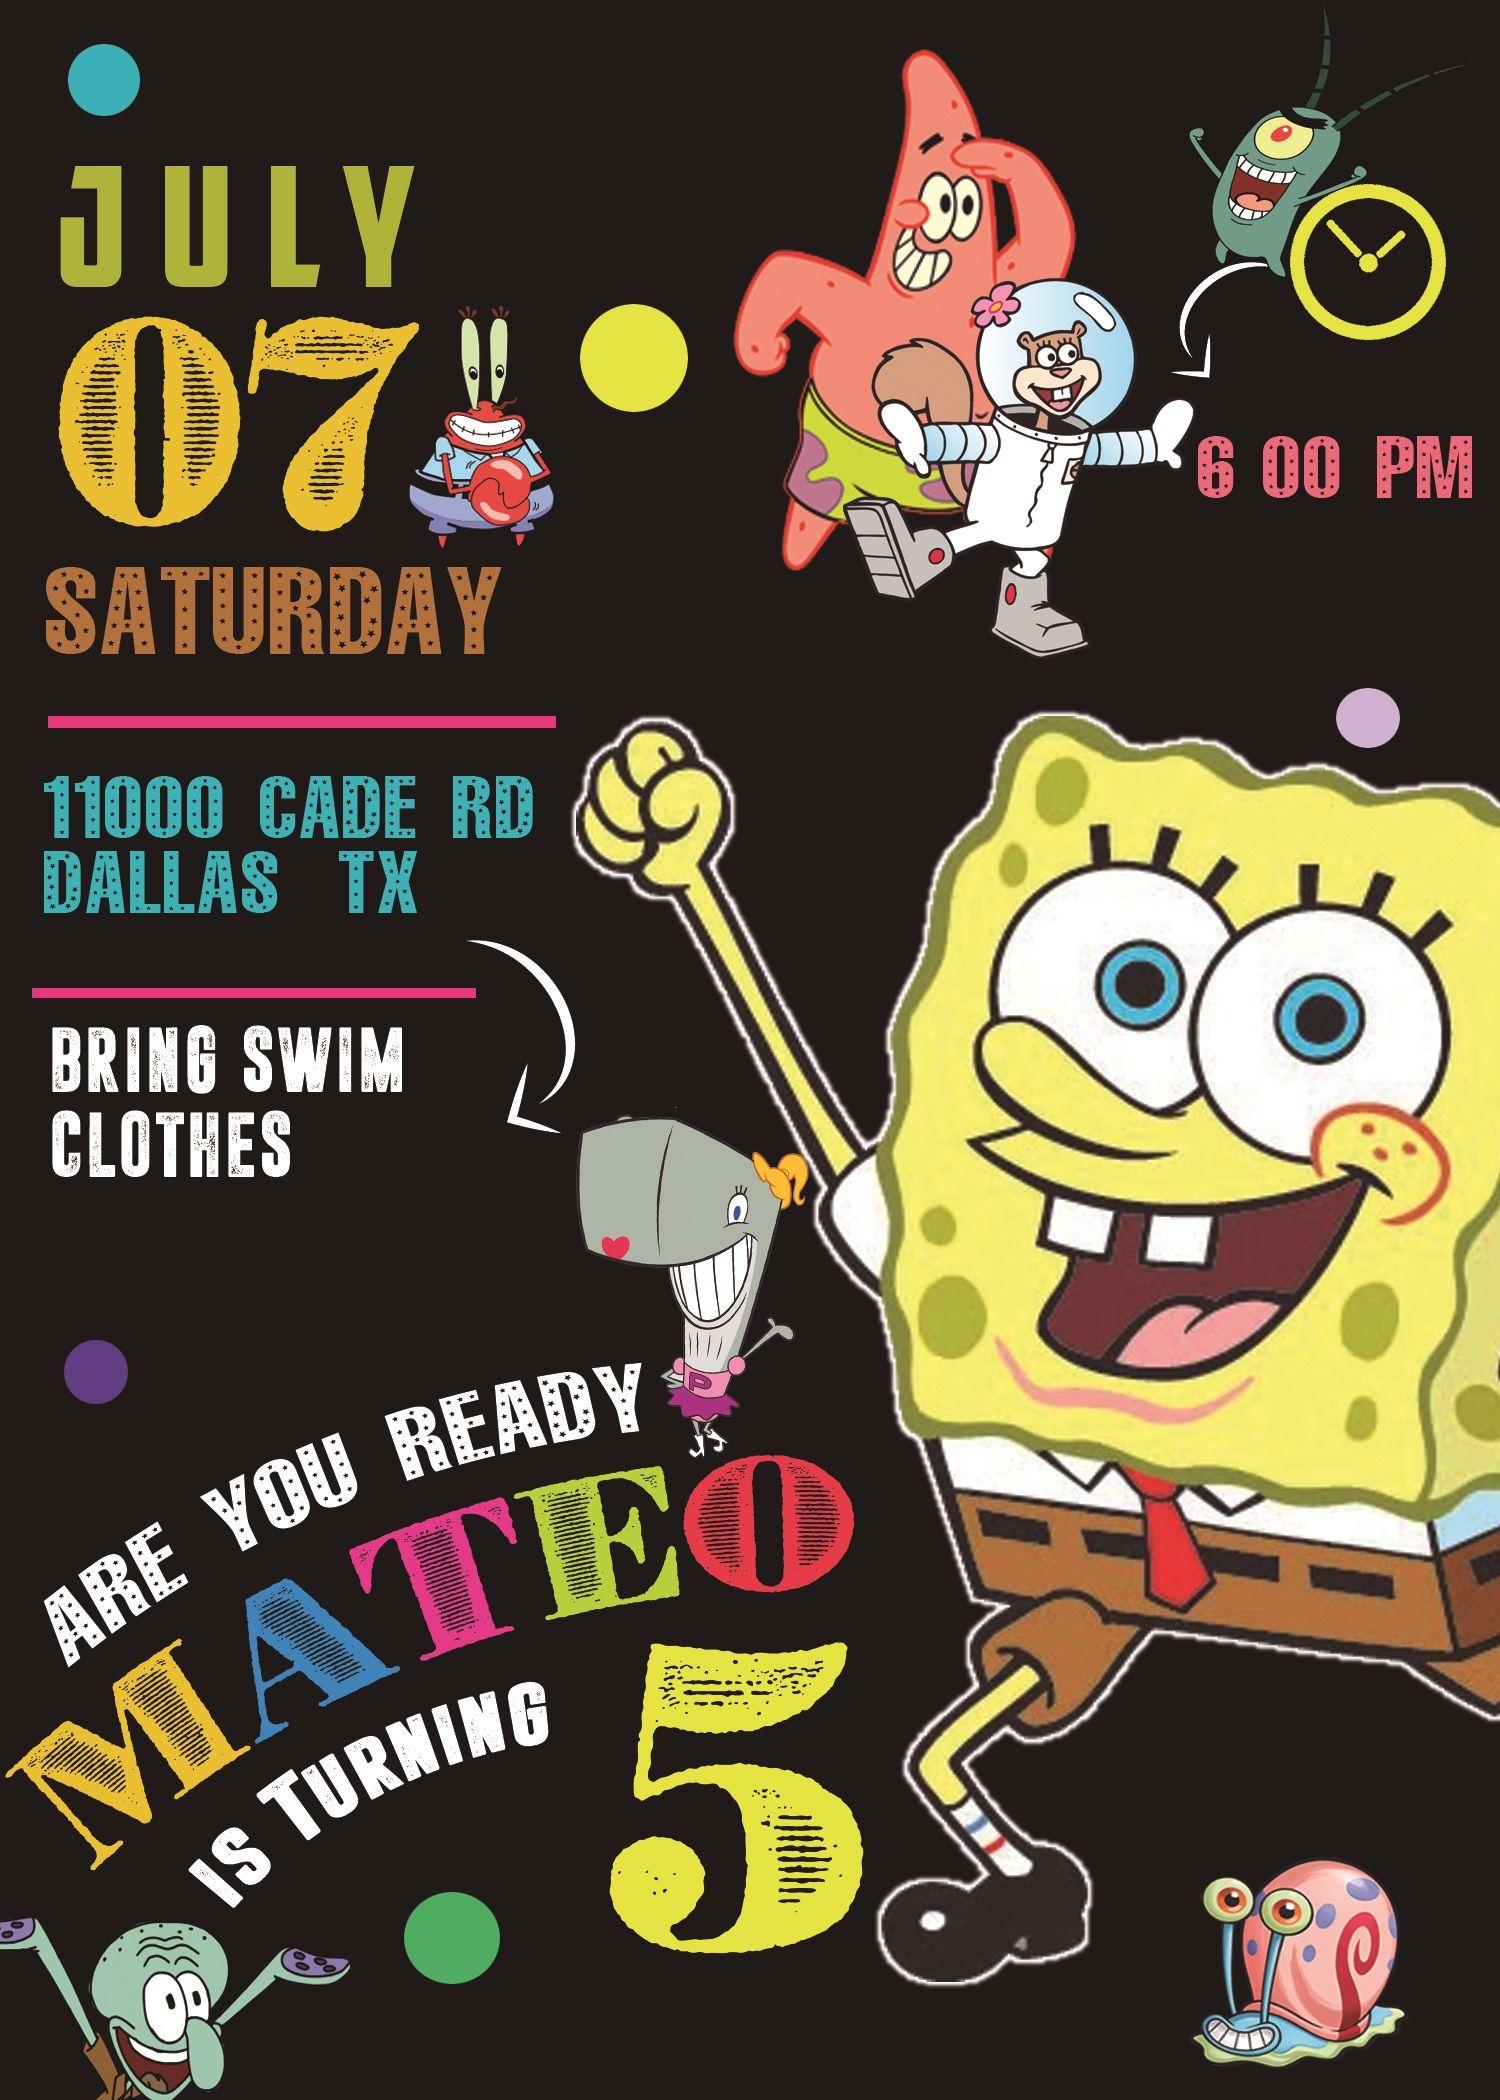 Spongebob Squarepants Birthday Invitation Oscarsitosroom Spongebob Birthday Party Spongebob Birthday Spongebob Squarepants Party